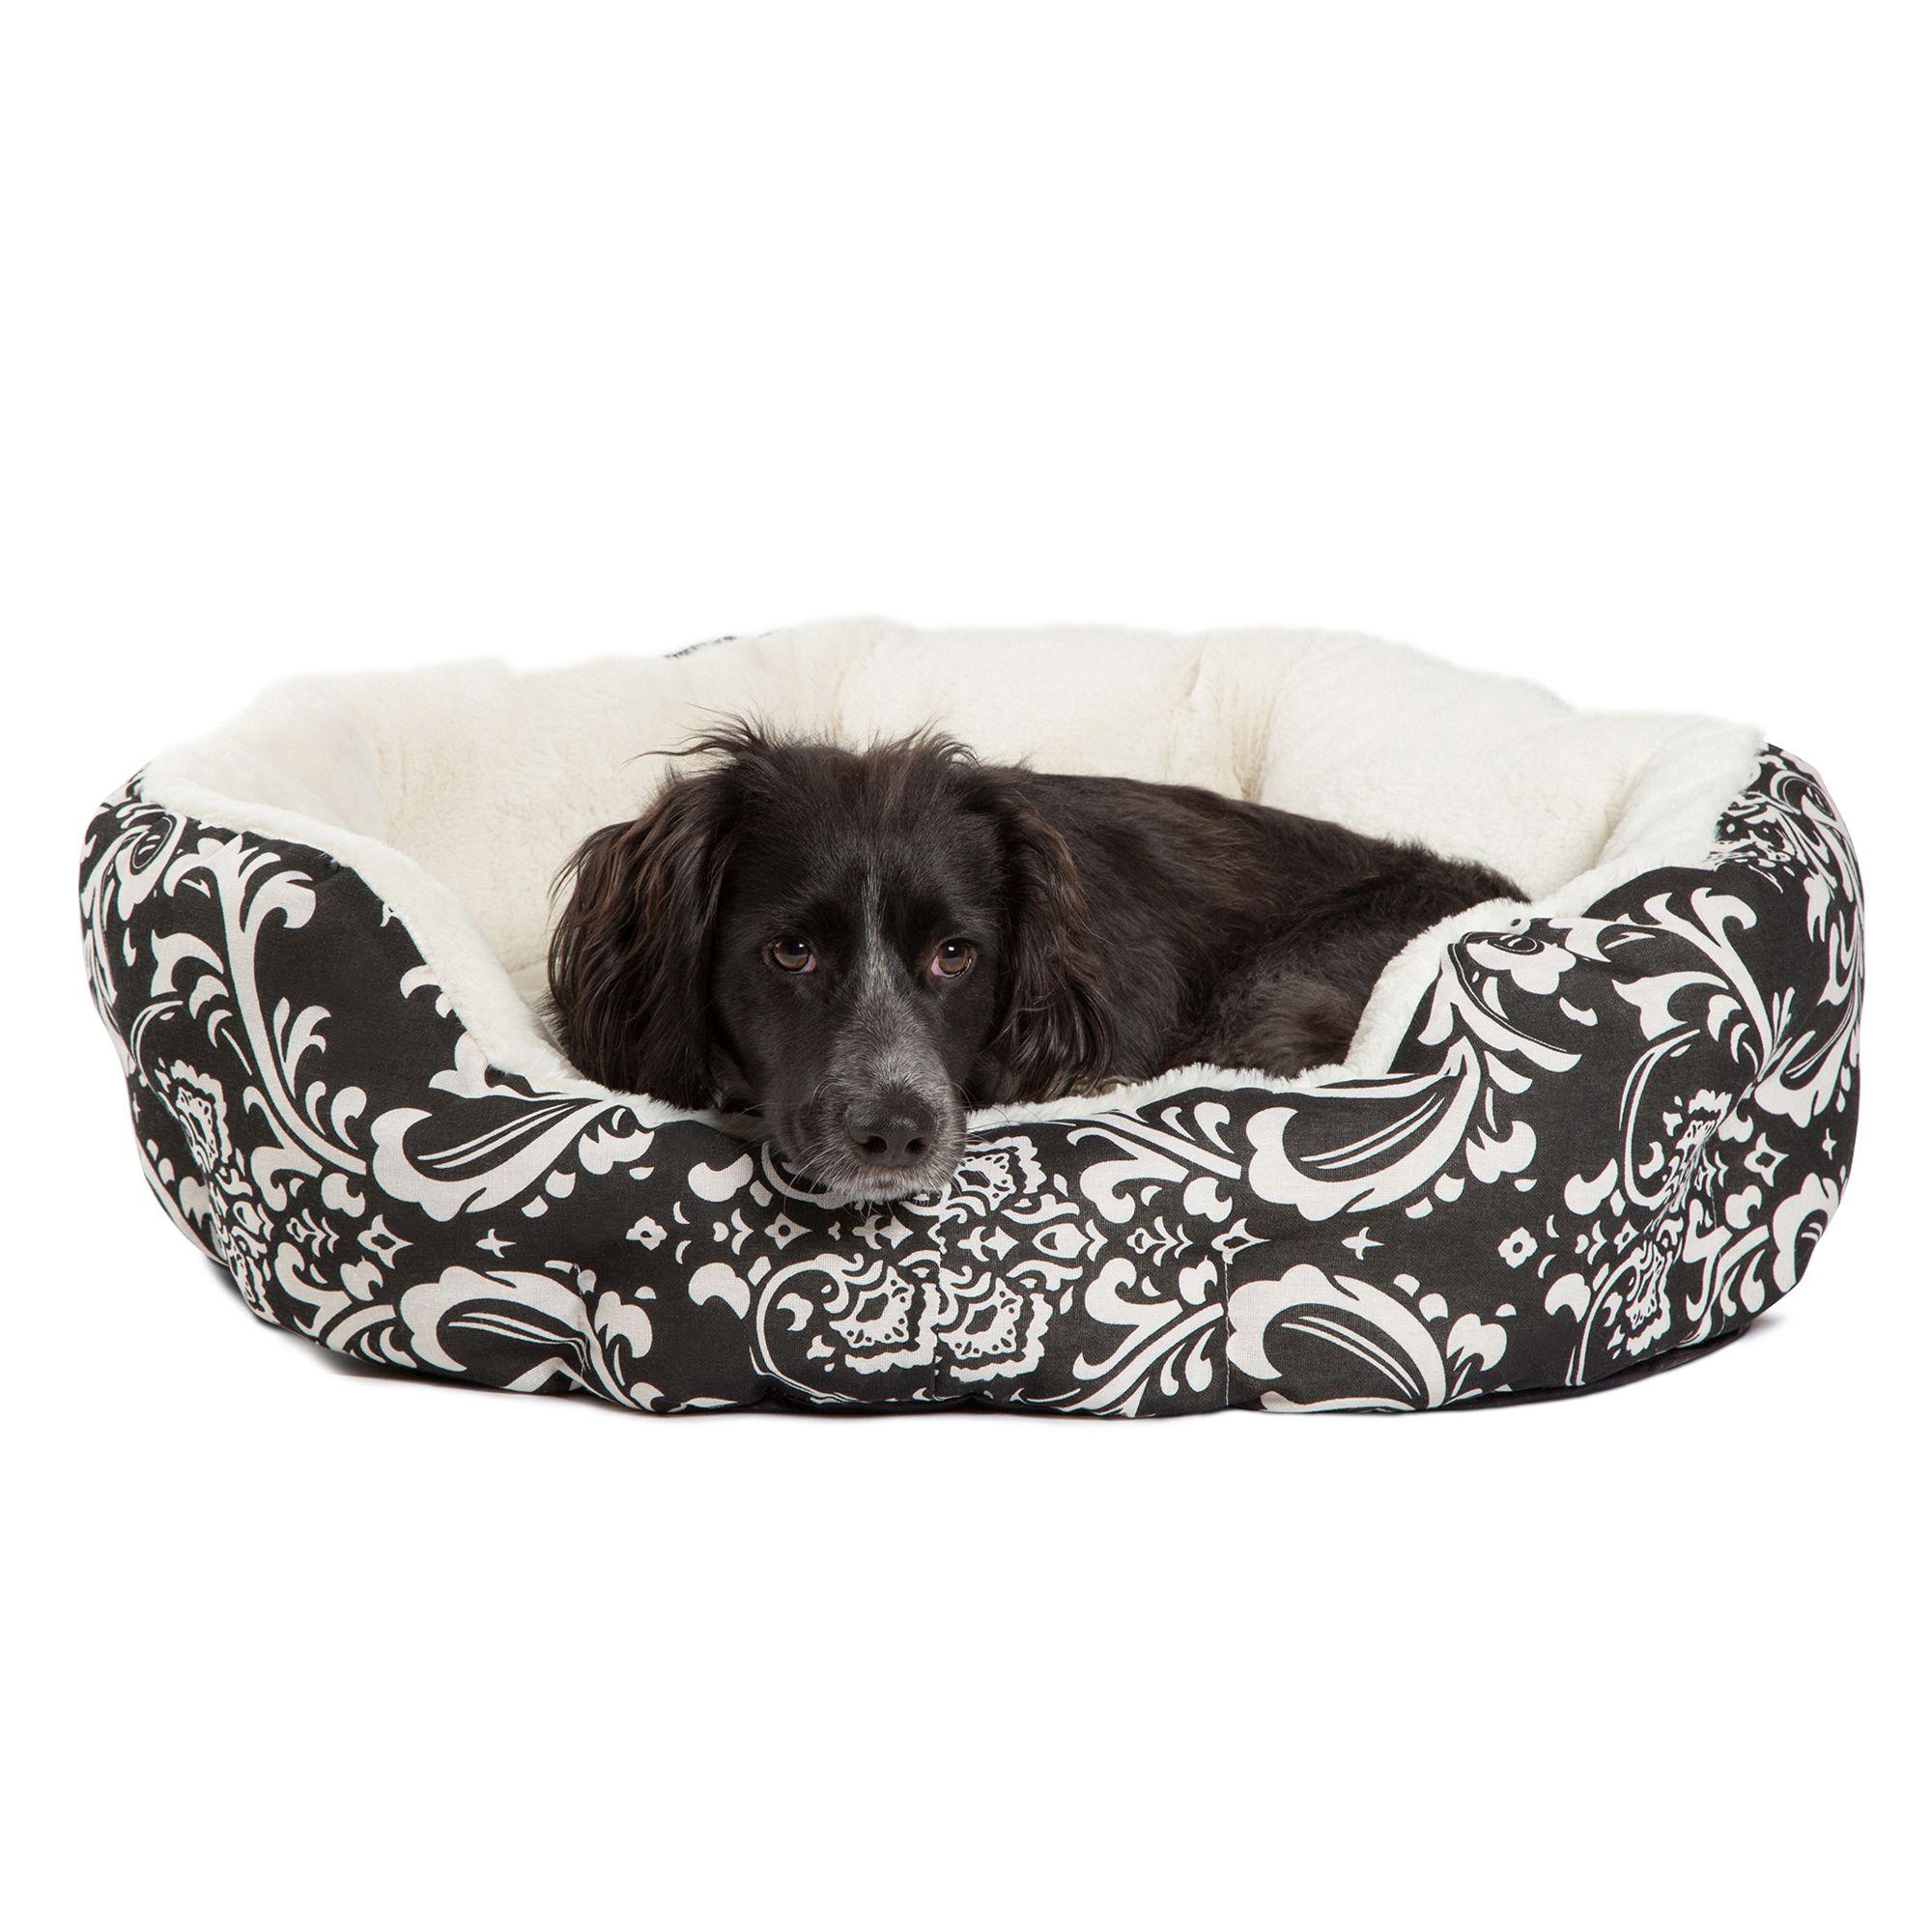 Best Friends By Sheri Cuddler Pet Bed Size 16l X 16w X 6h Black